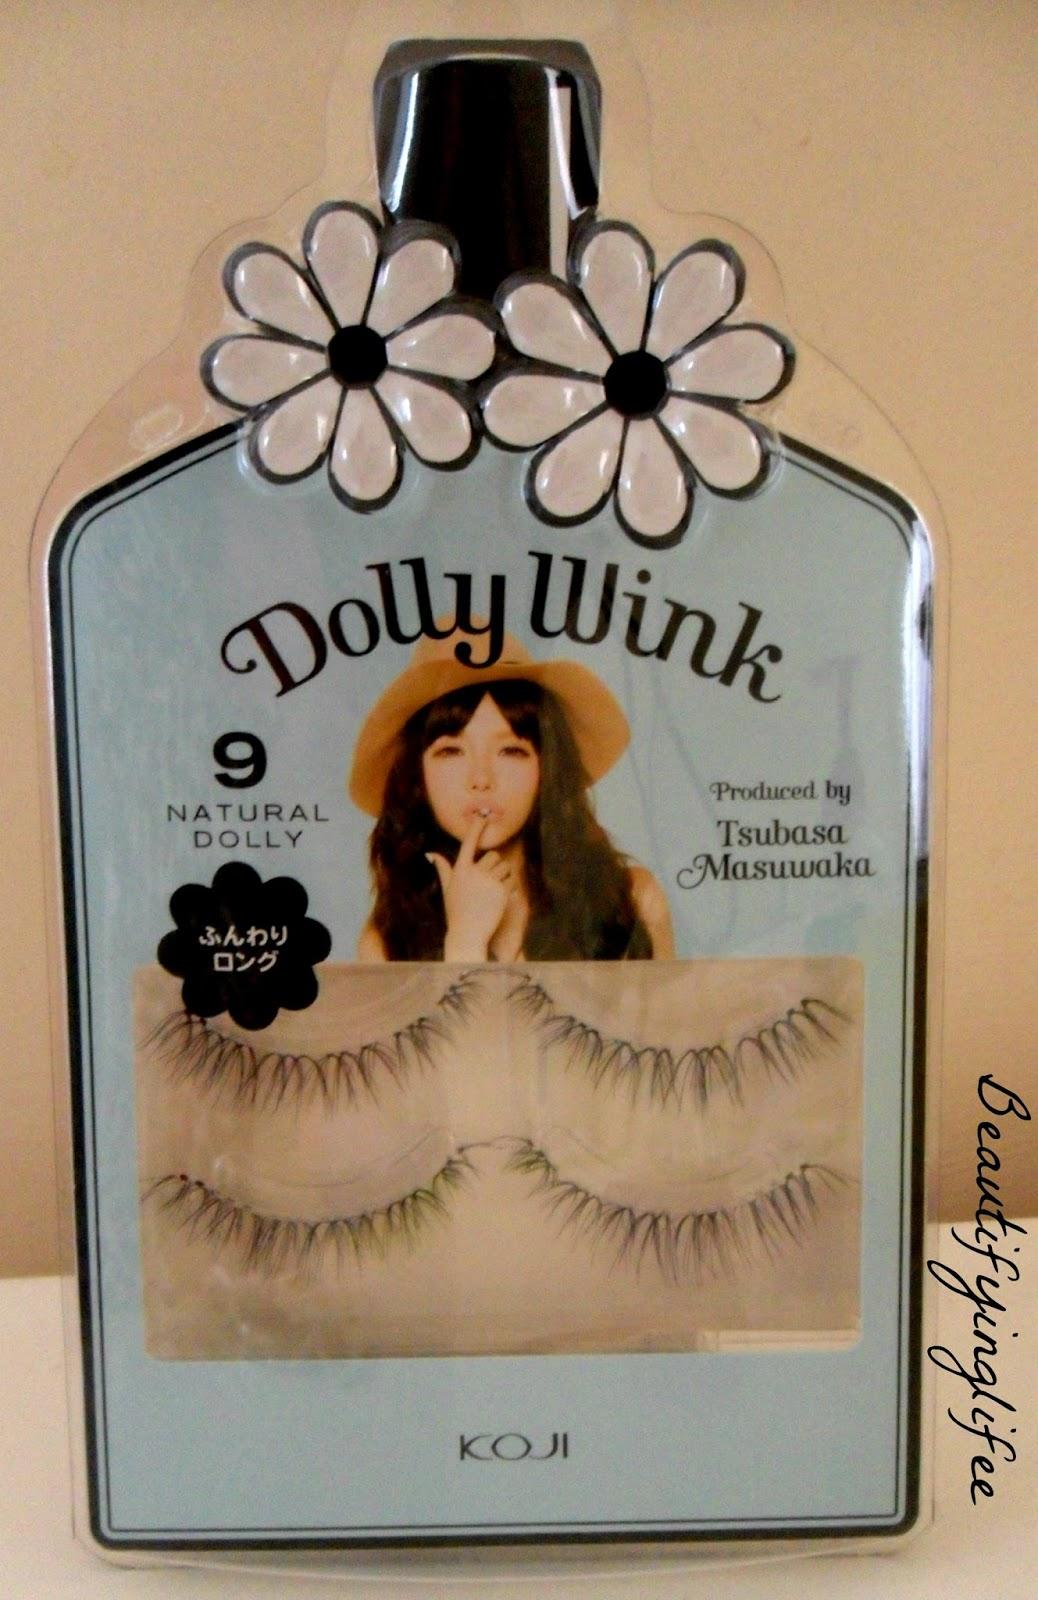 Review Dolly Wink False Eyelashes Natural Dolly Dolly Wink